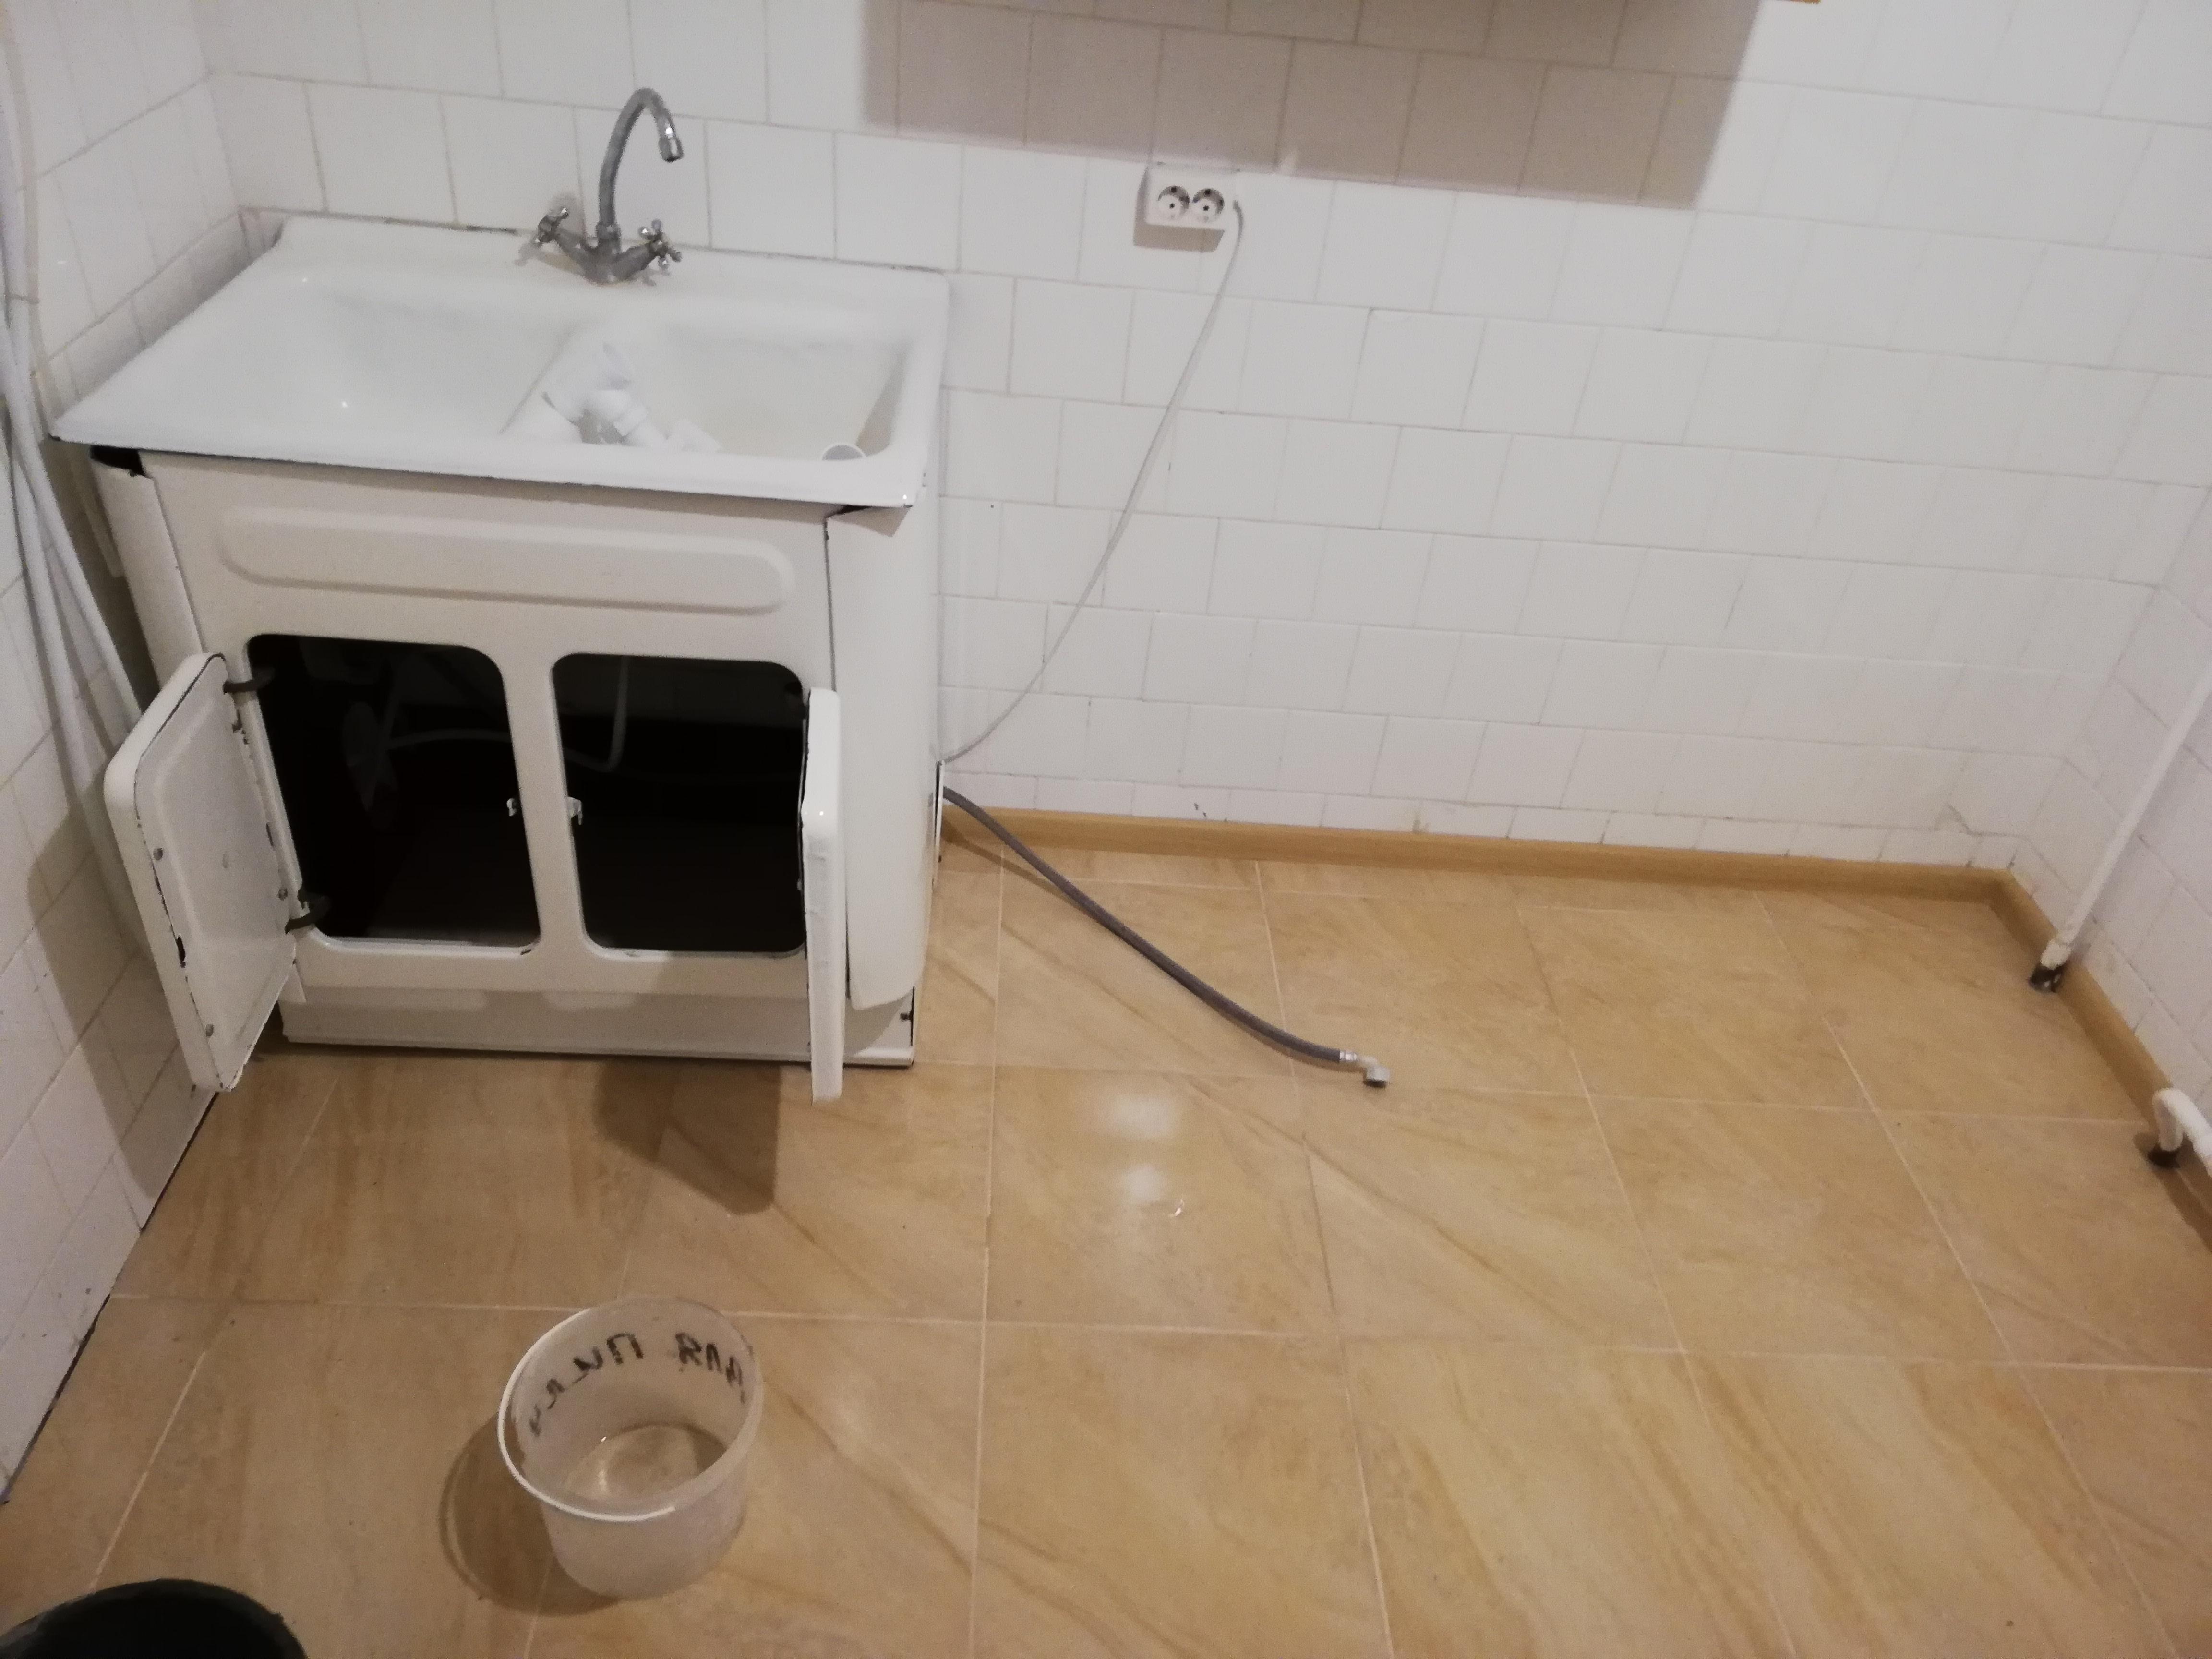 Фото Укладка плитки на пол, с заливкой черновой стяжки.